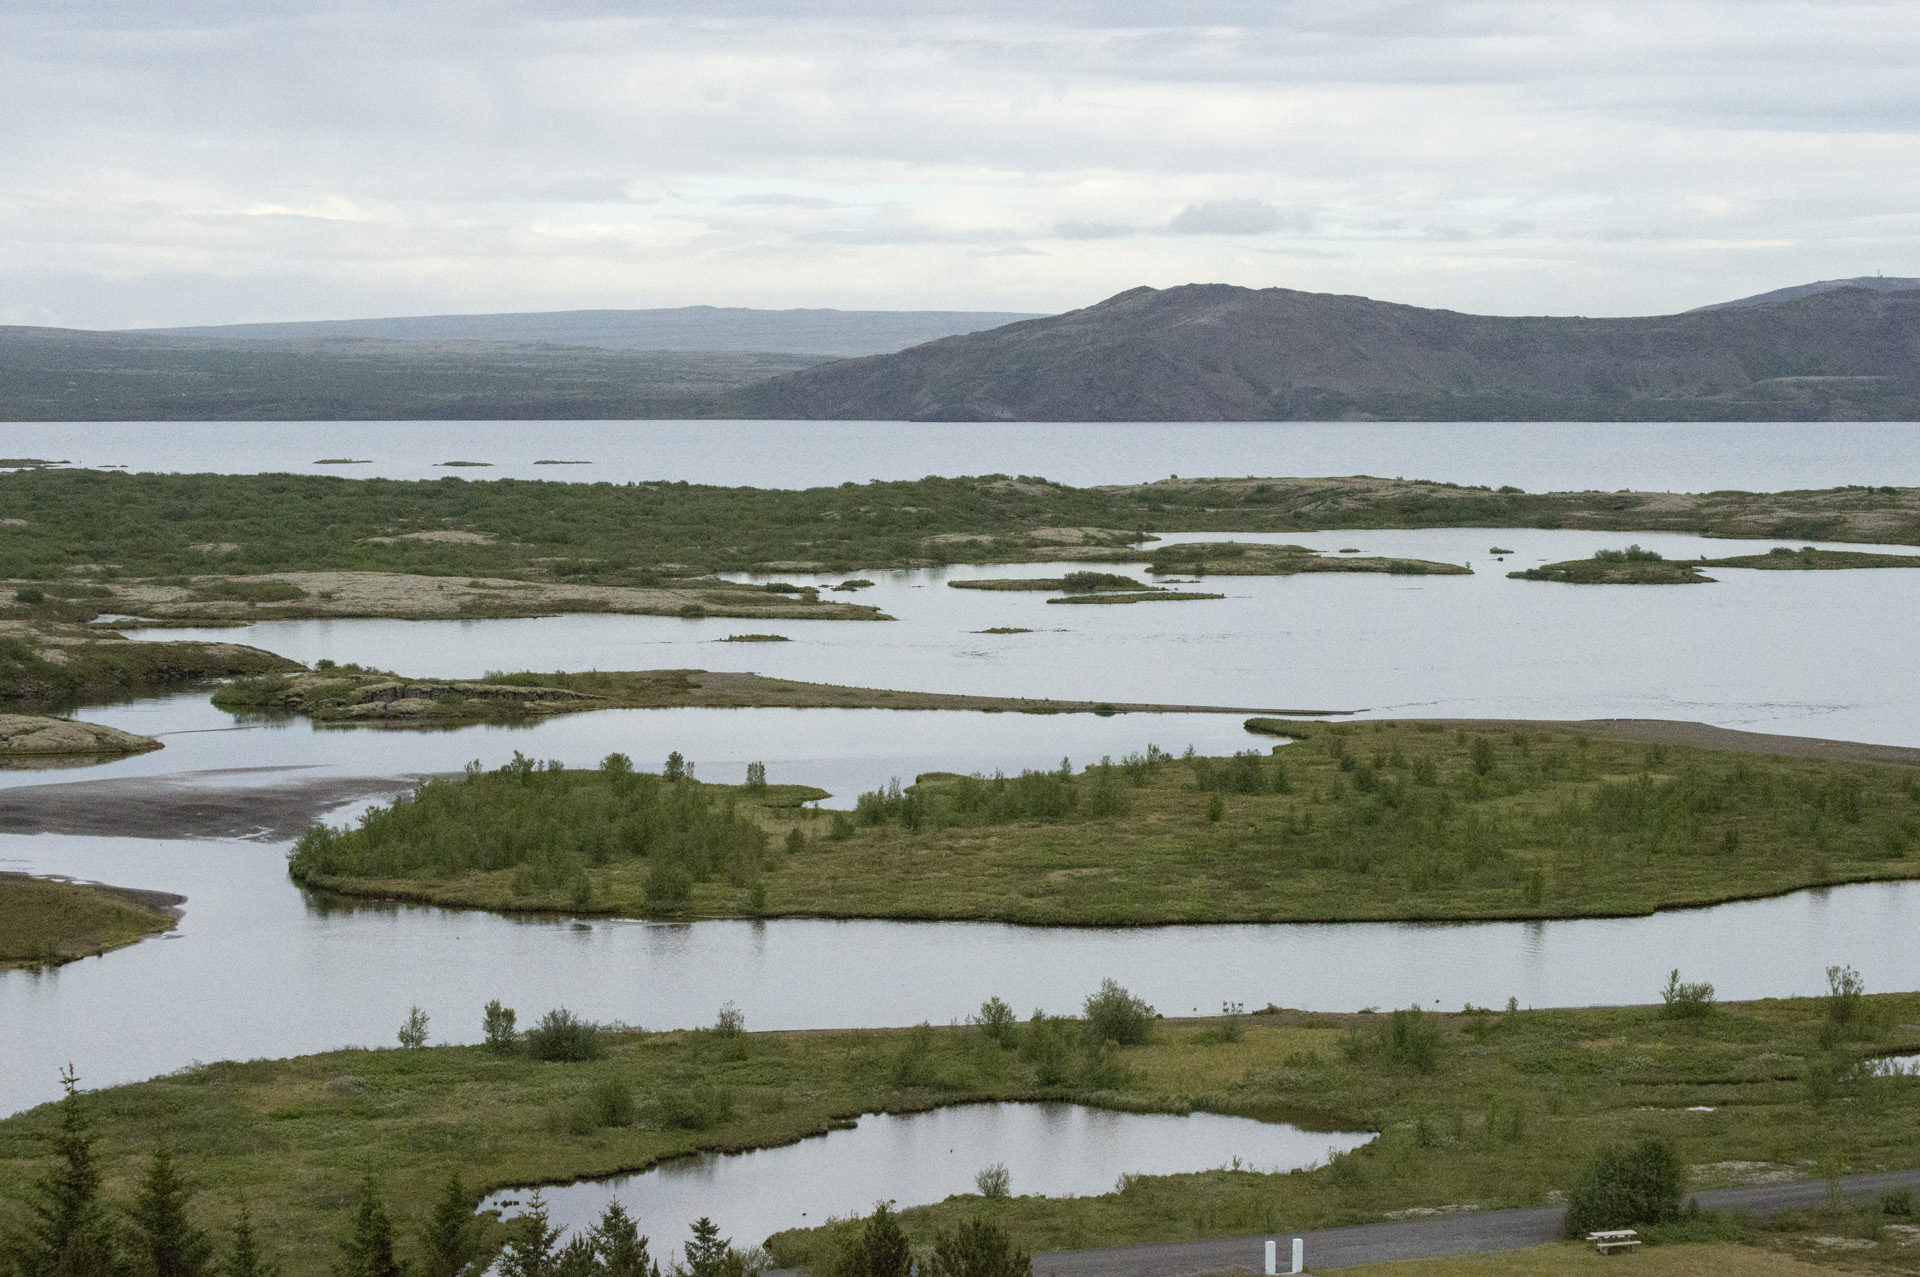 The rim of Þingvallavatn lake, Þingvellir National Park, Suðurland region, Iceland.